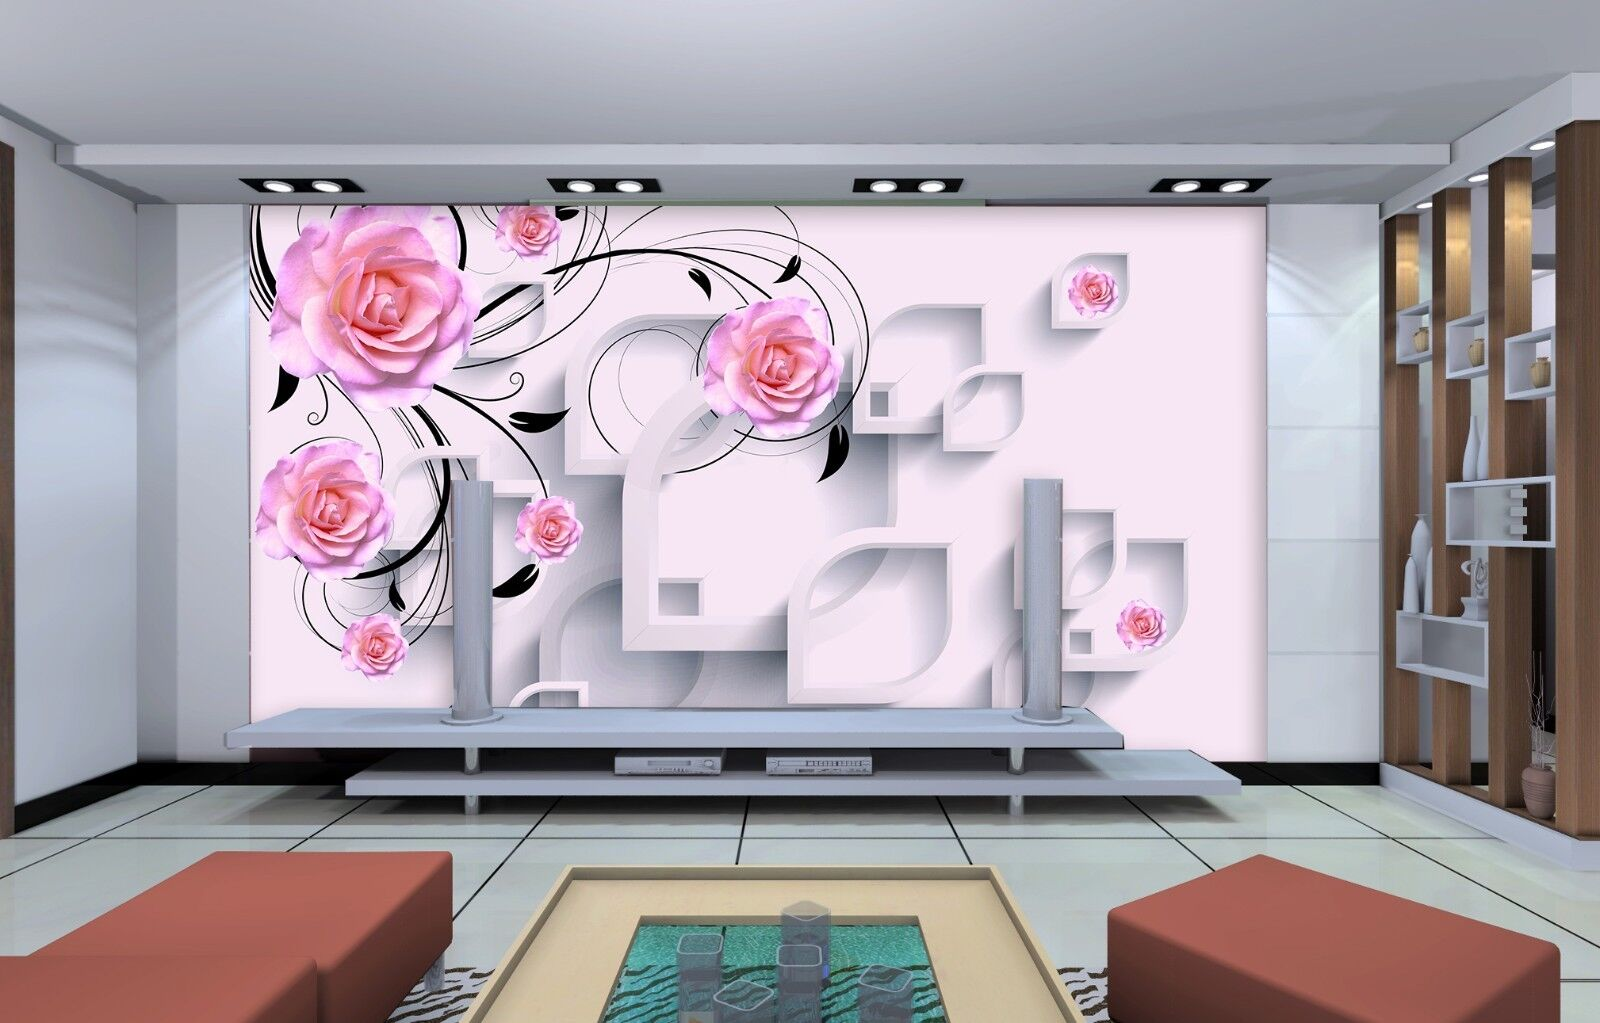 3D Rosa Blaumen Muster 993 Tapete Wandgemälde Tapeten Bild Familie DE Jenny | Perfekt In Verarbeitung  | Moderater Preis  | Vollständige Spezifikation